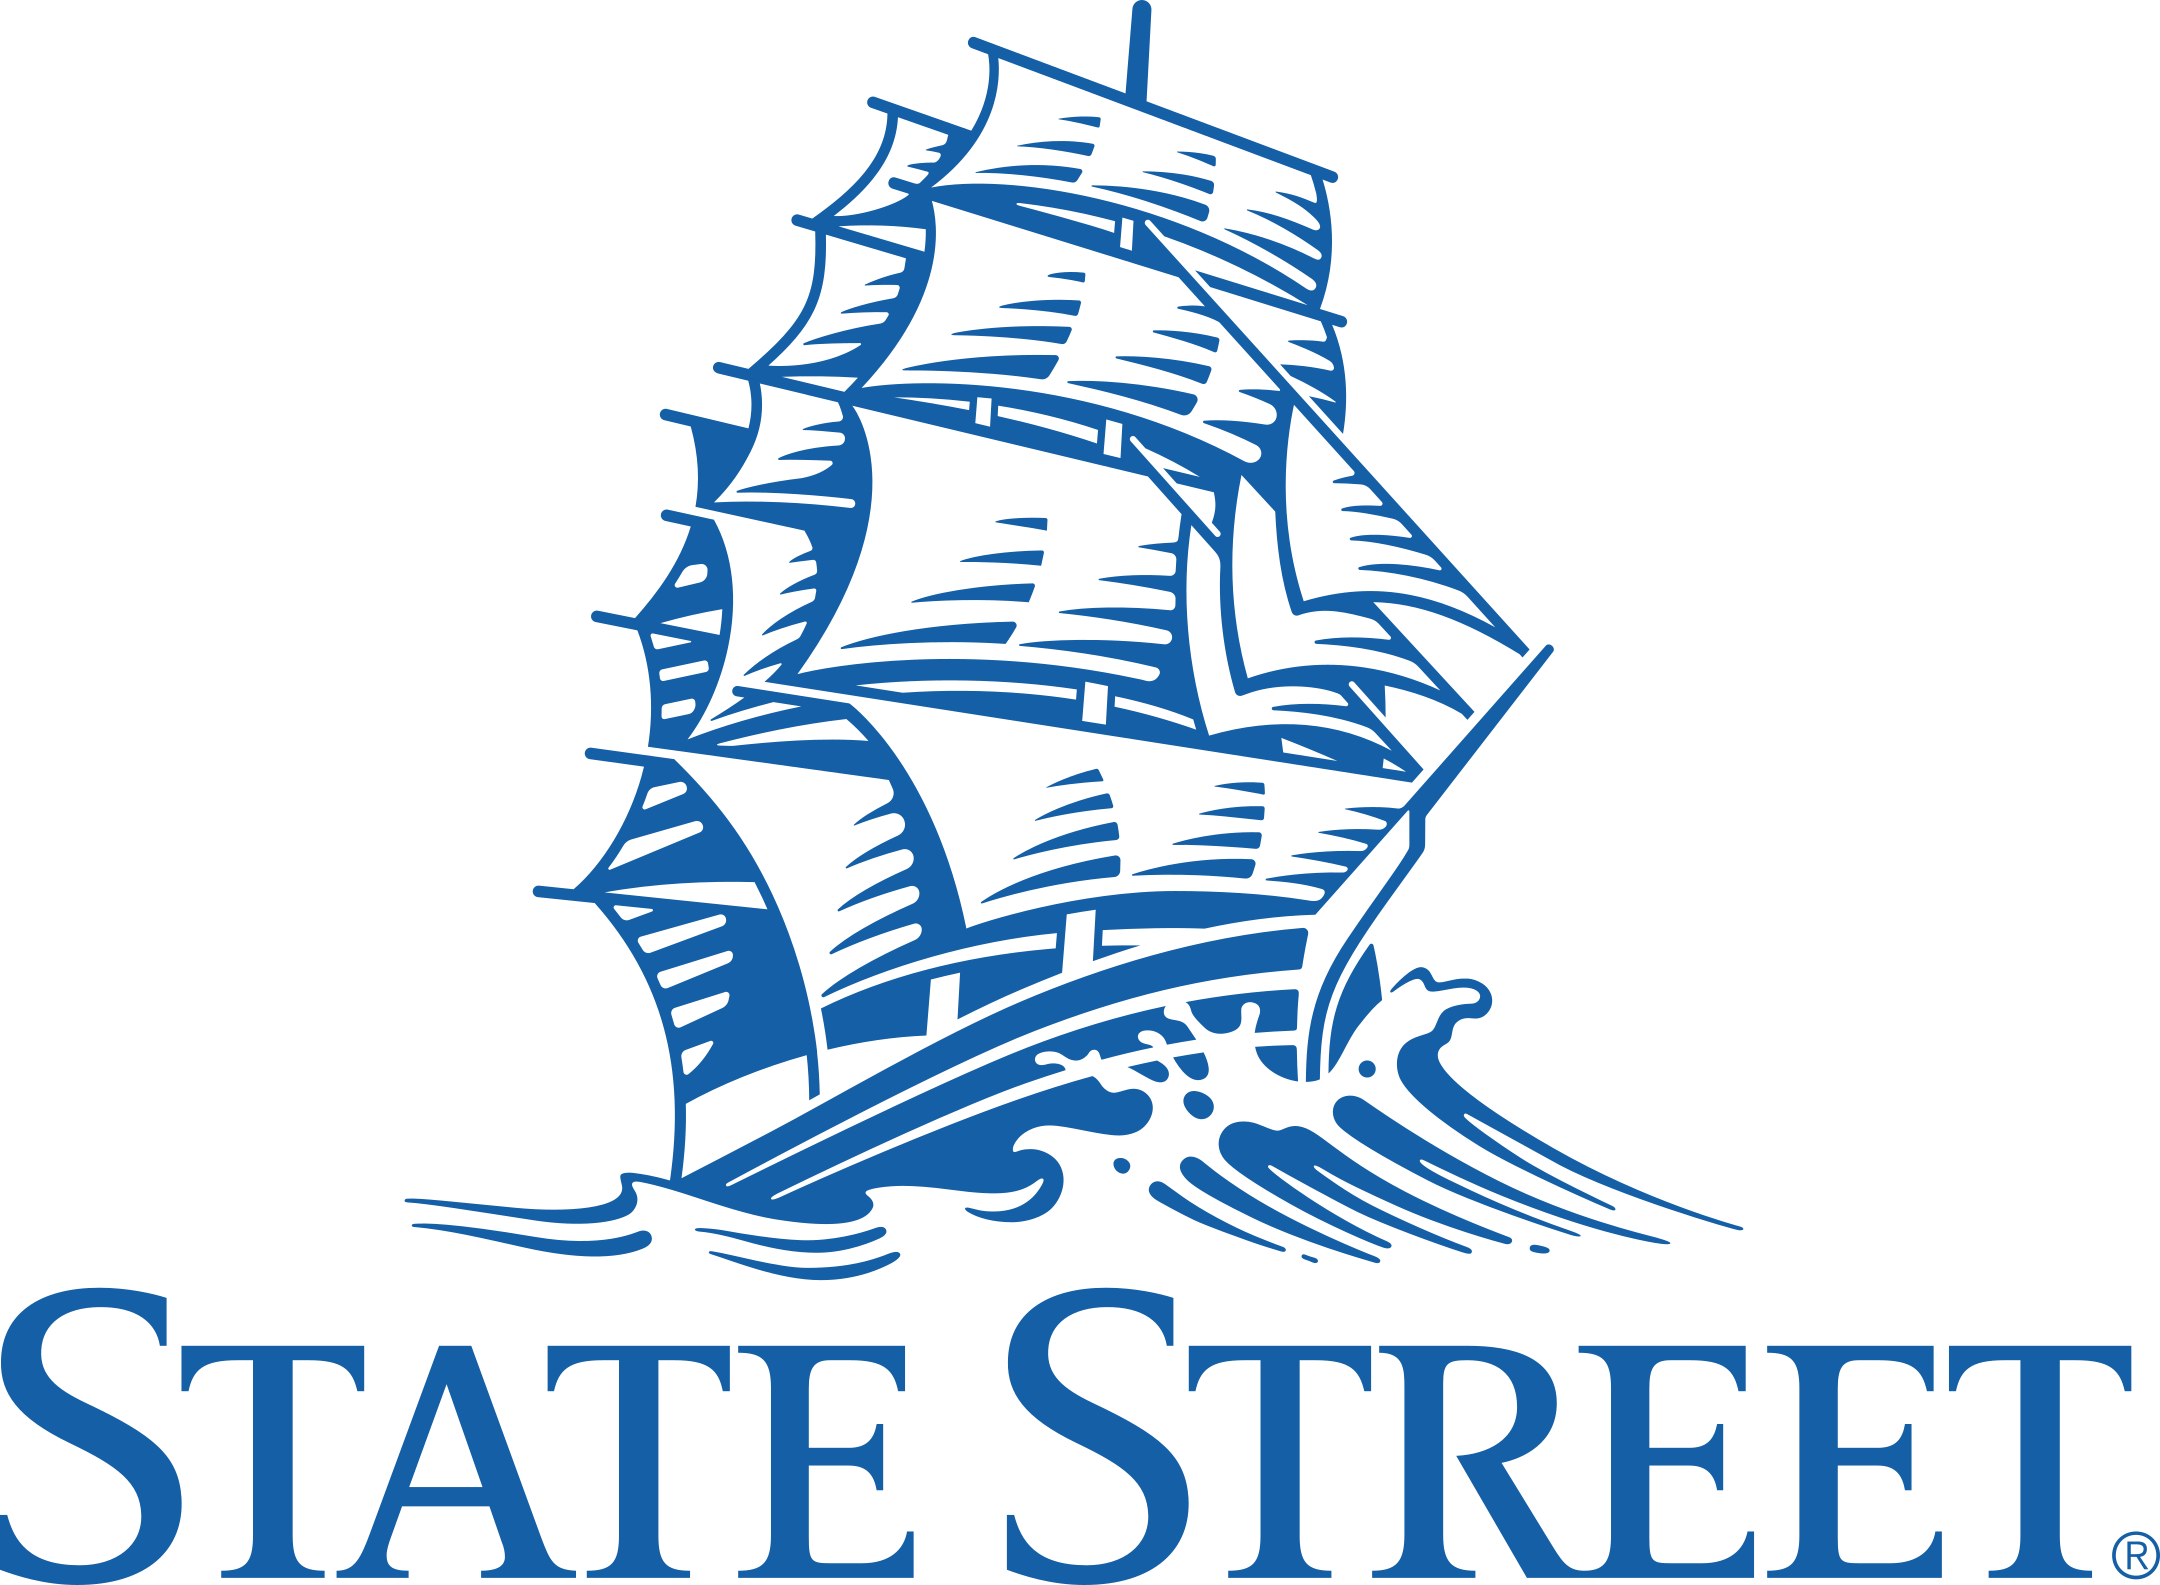 state street logo 1 - State Street Corporation Logo